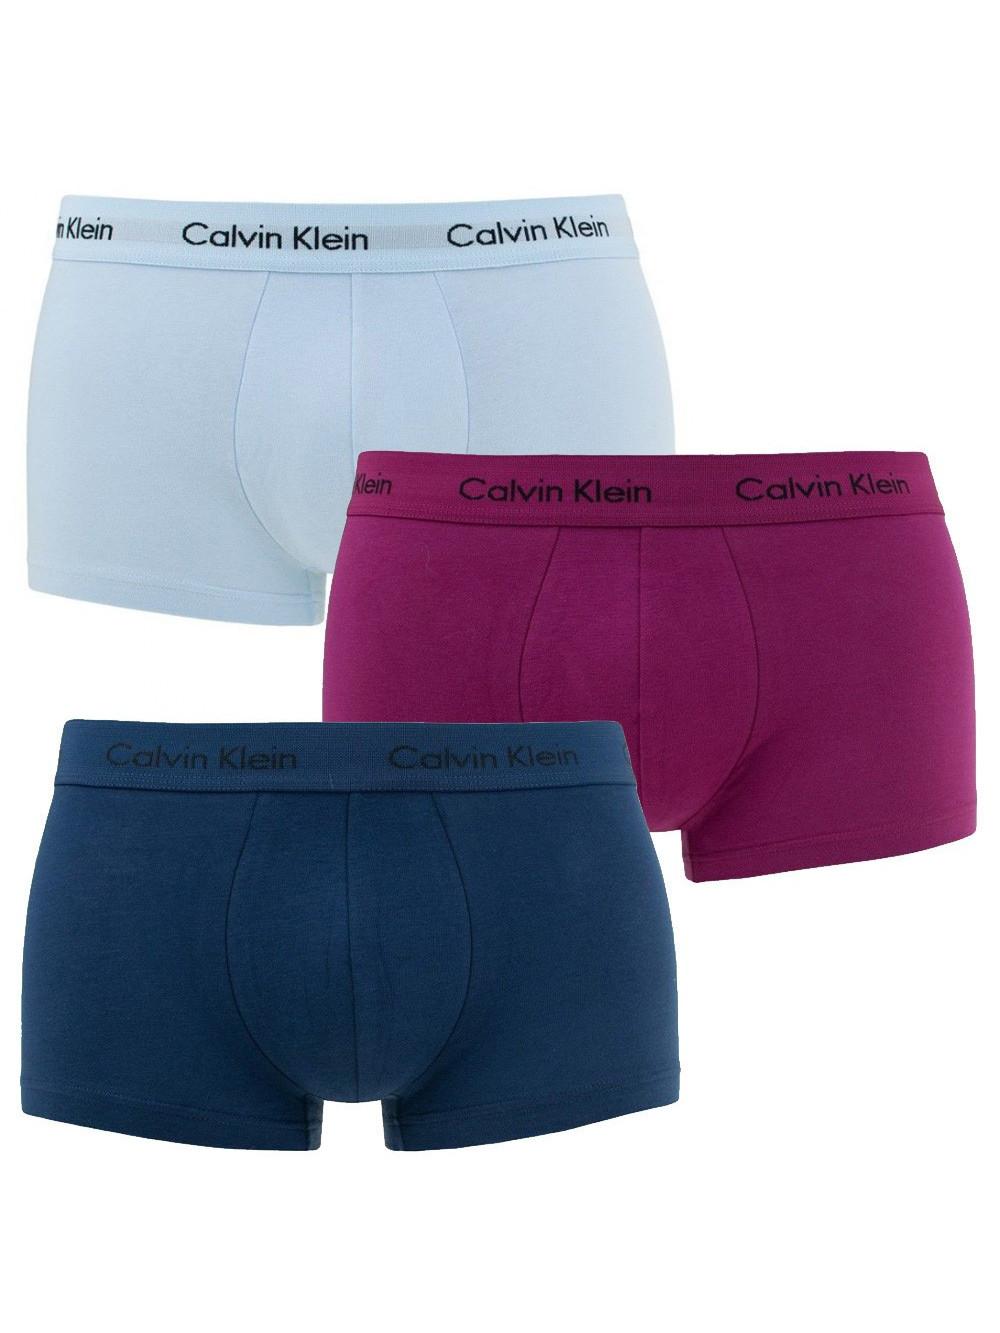 Pánske boxerky Calvin Klein Cotton Stretch biele, modré, fialové 3-pack